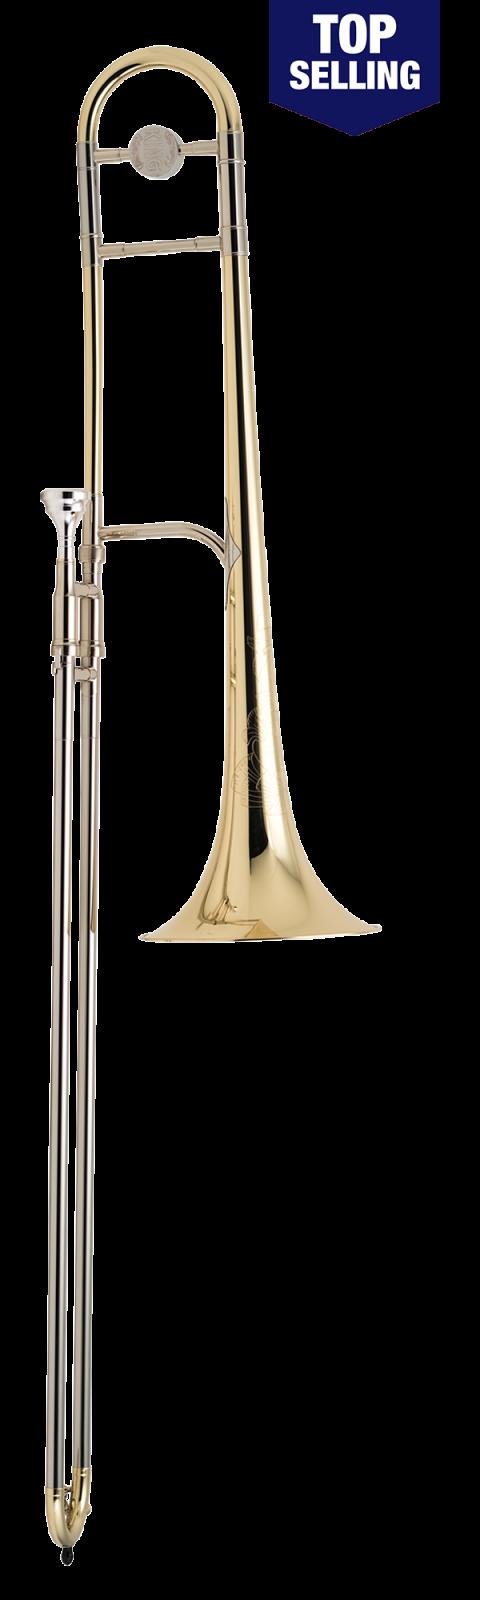 King Model 2B Trombone